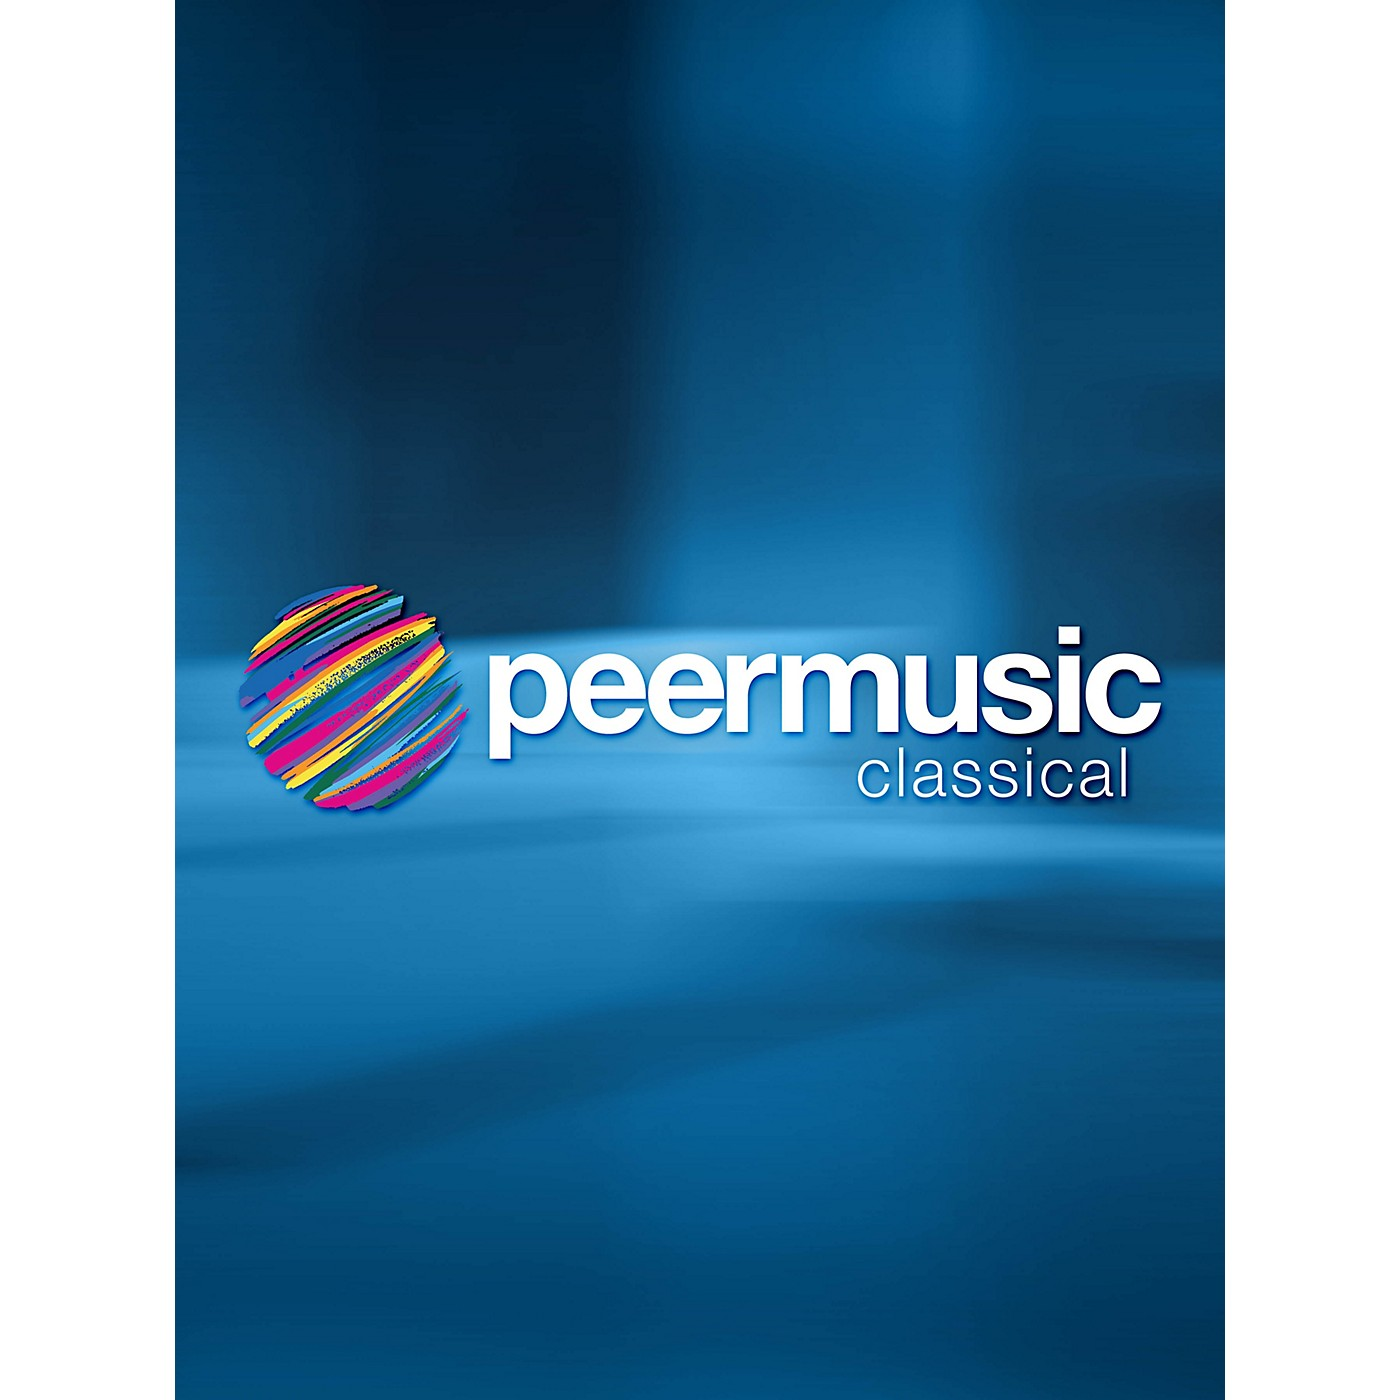 Peer Music Cantos de España (for 2 Guitars) Peermusic Classical Series Composed by Isaac Albeniz thumbnail